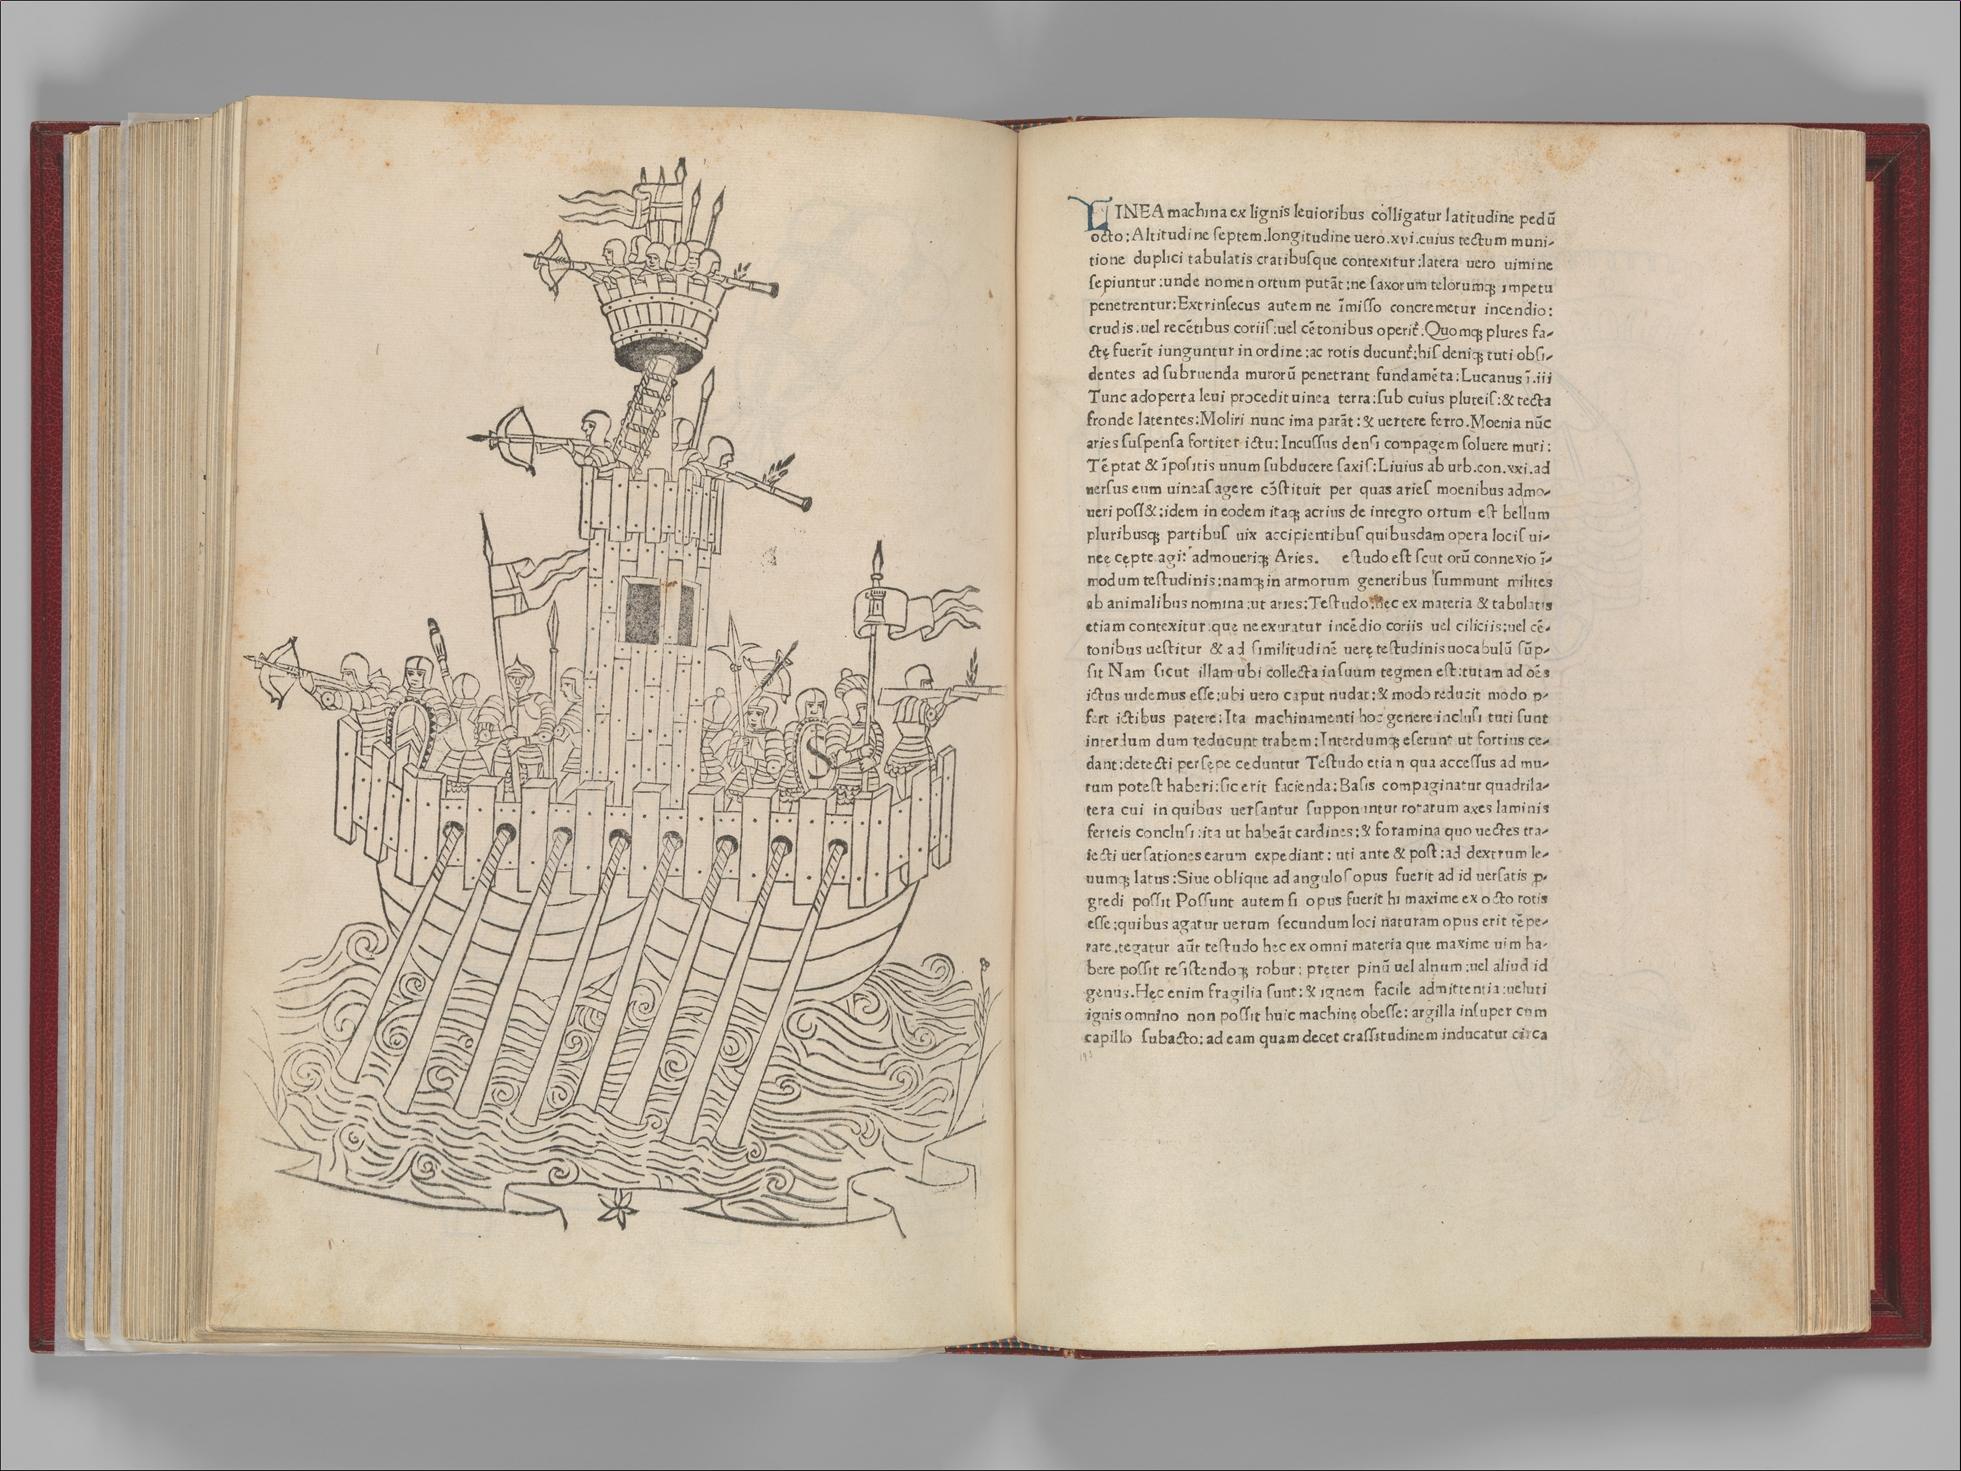 Roberto Valturio, <i>De Re Militari</i> (Verona, 1472).